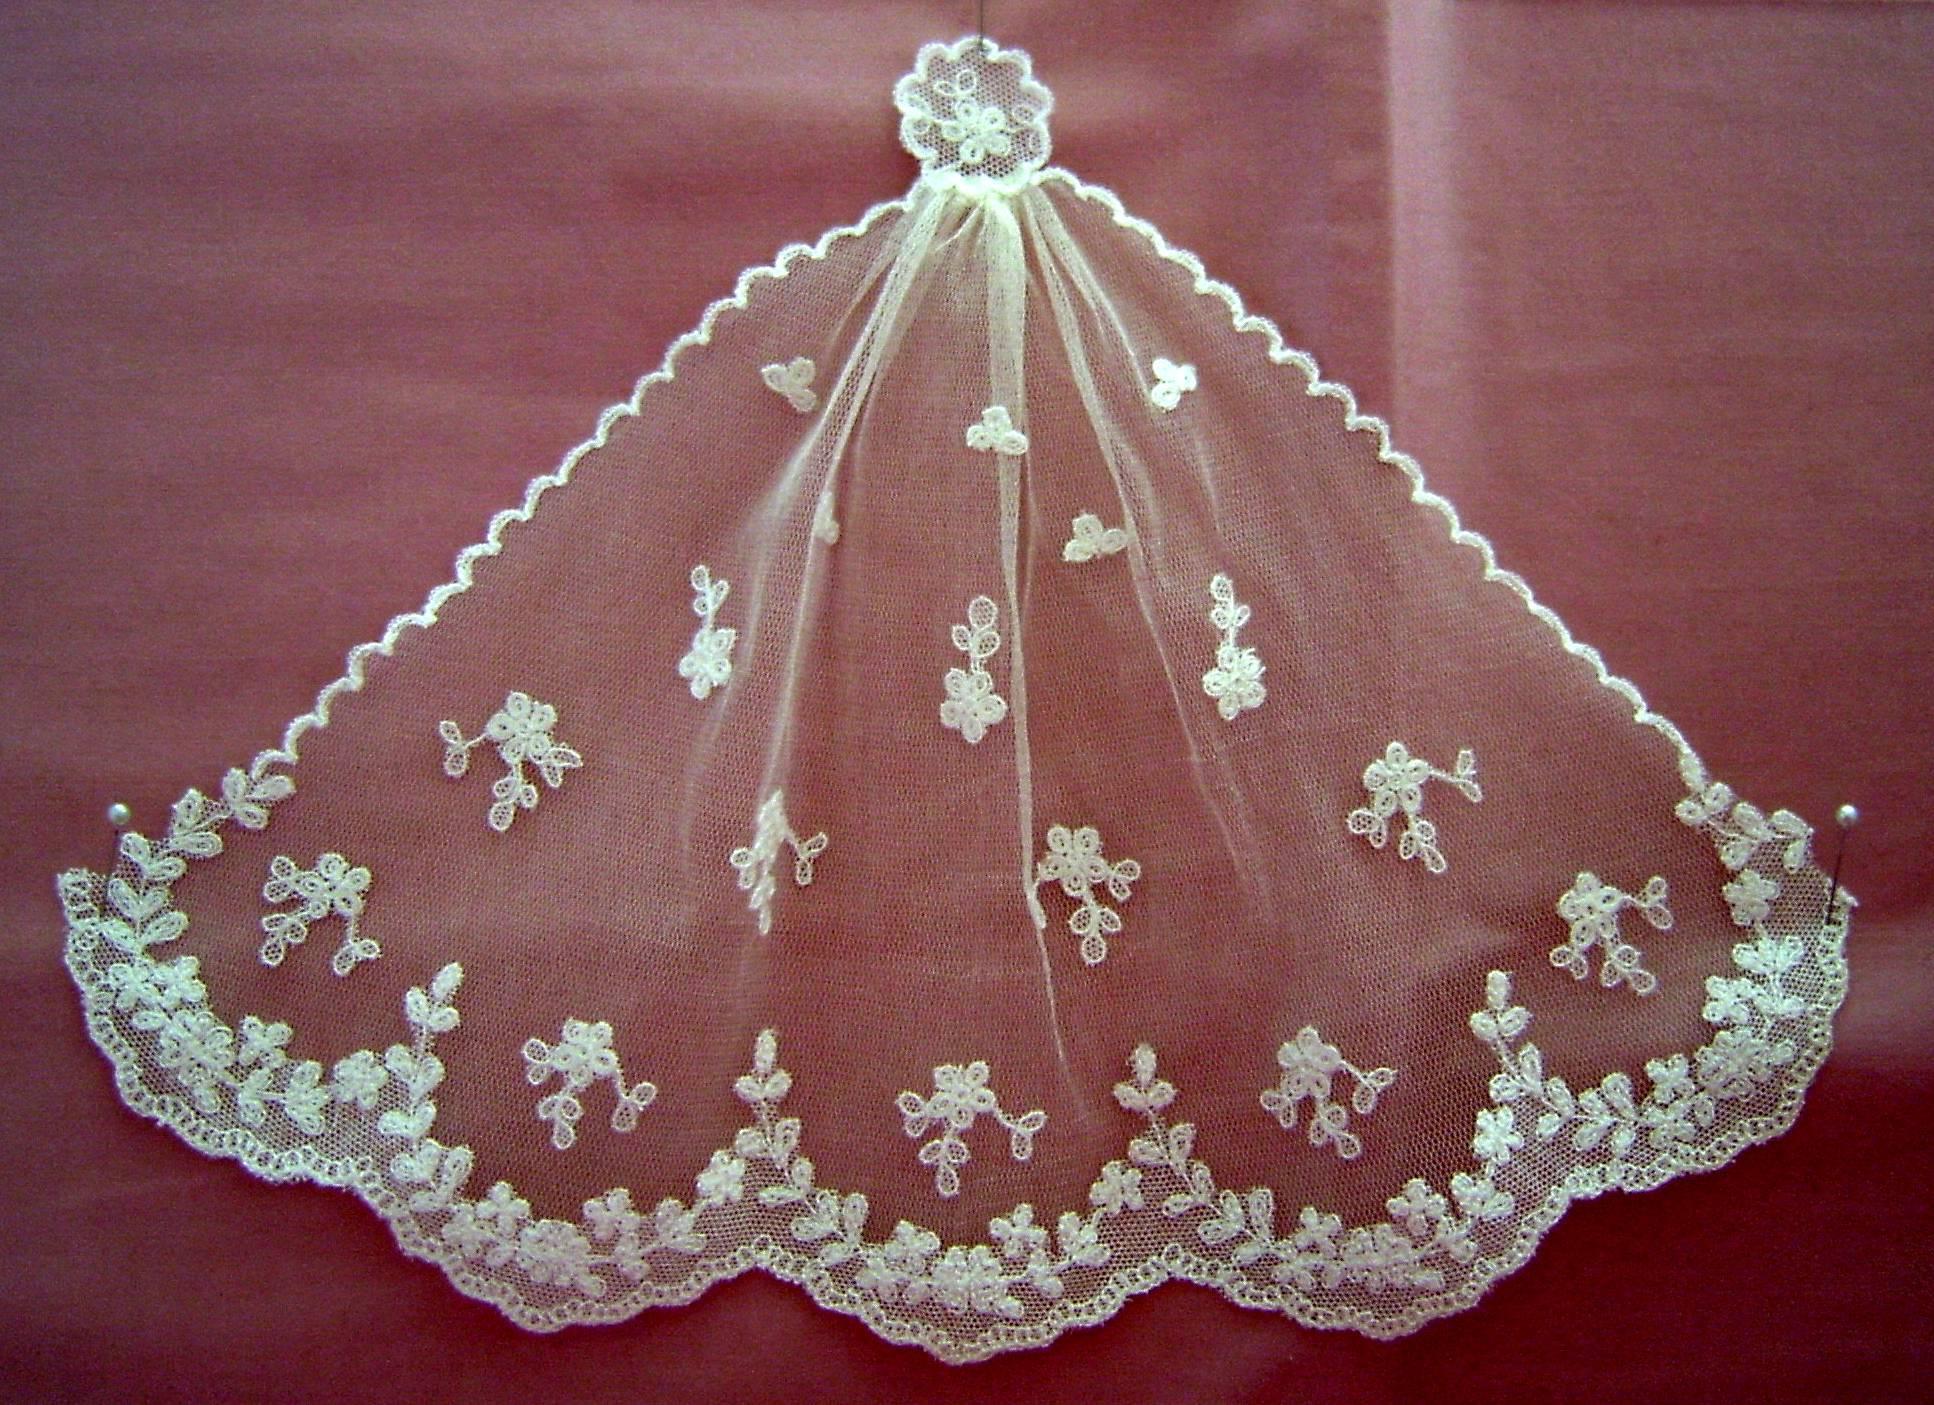 Jackie Kennedy Wedding Veil  JACKIE KENNEDY VEIL SPREAD OUT – Angeliqueminiatures Blog